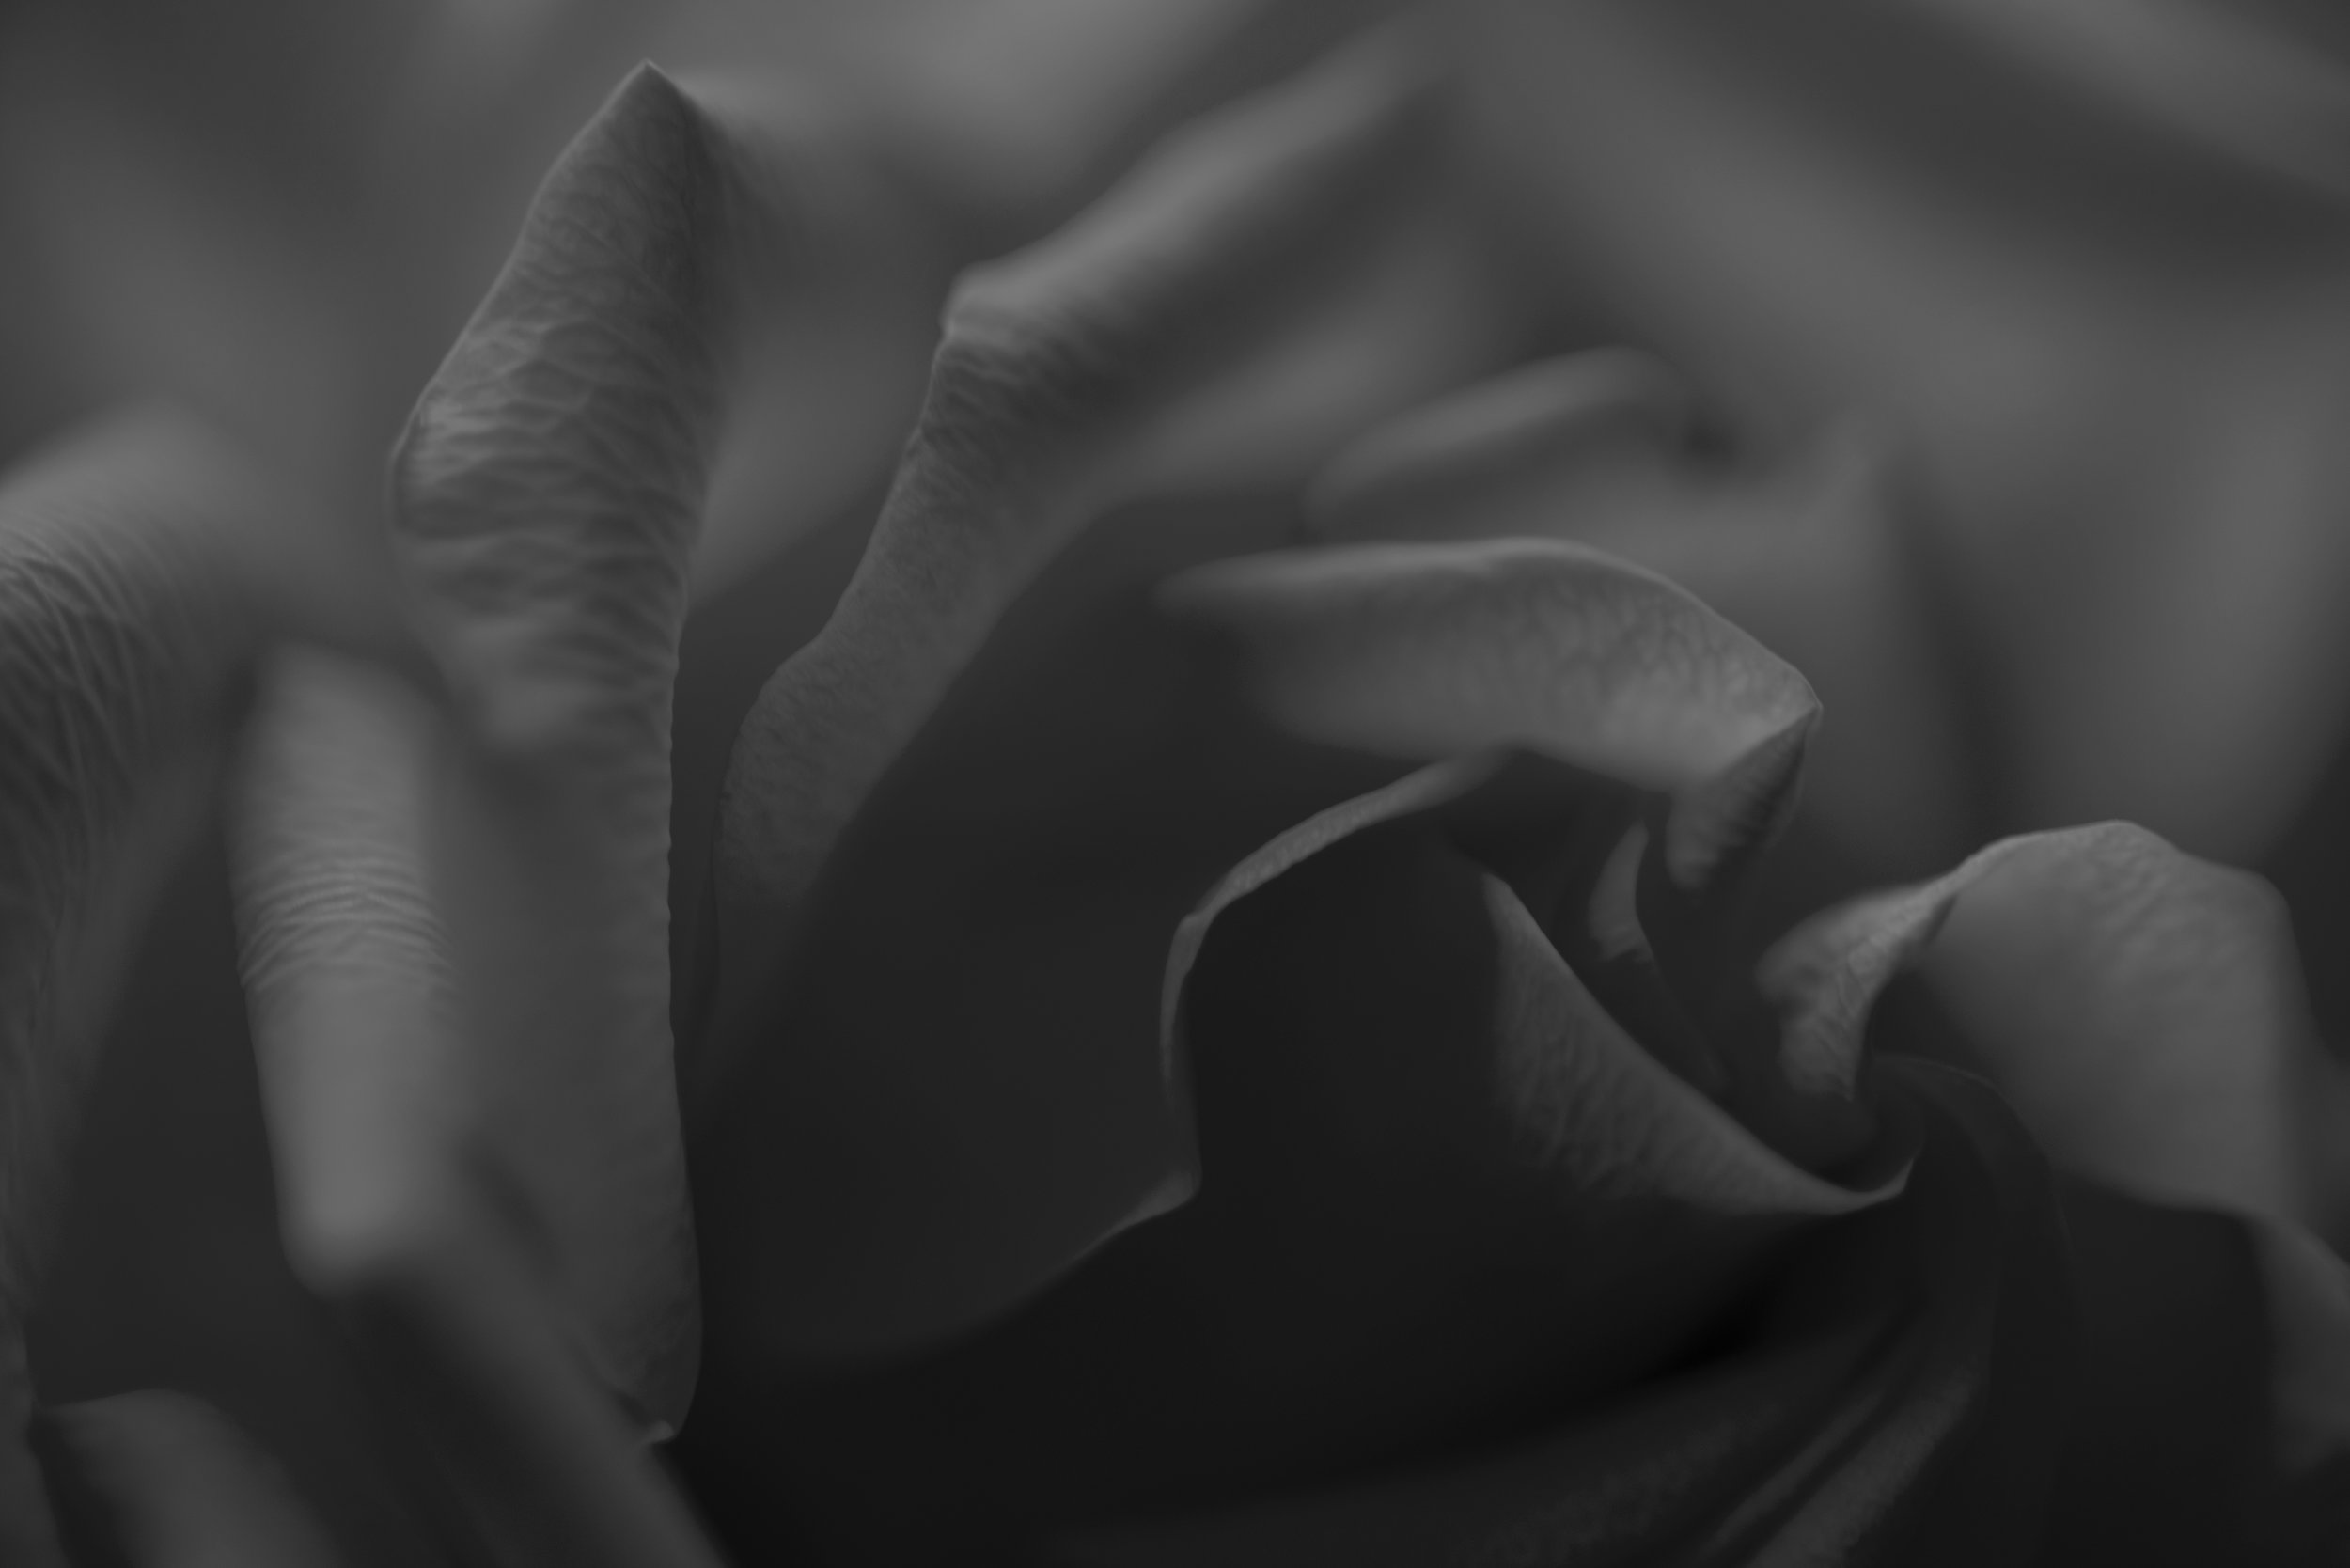 8914bwflower.jpg